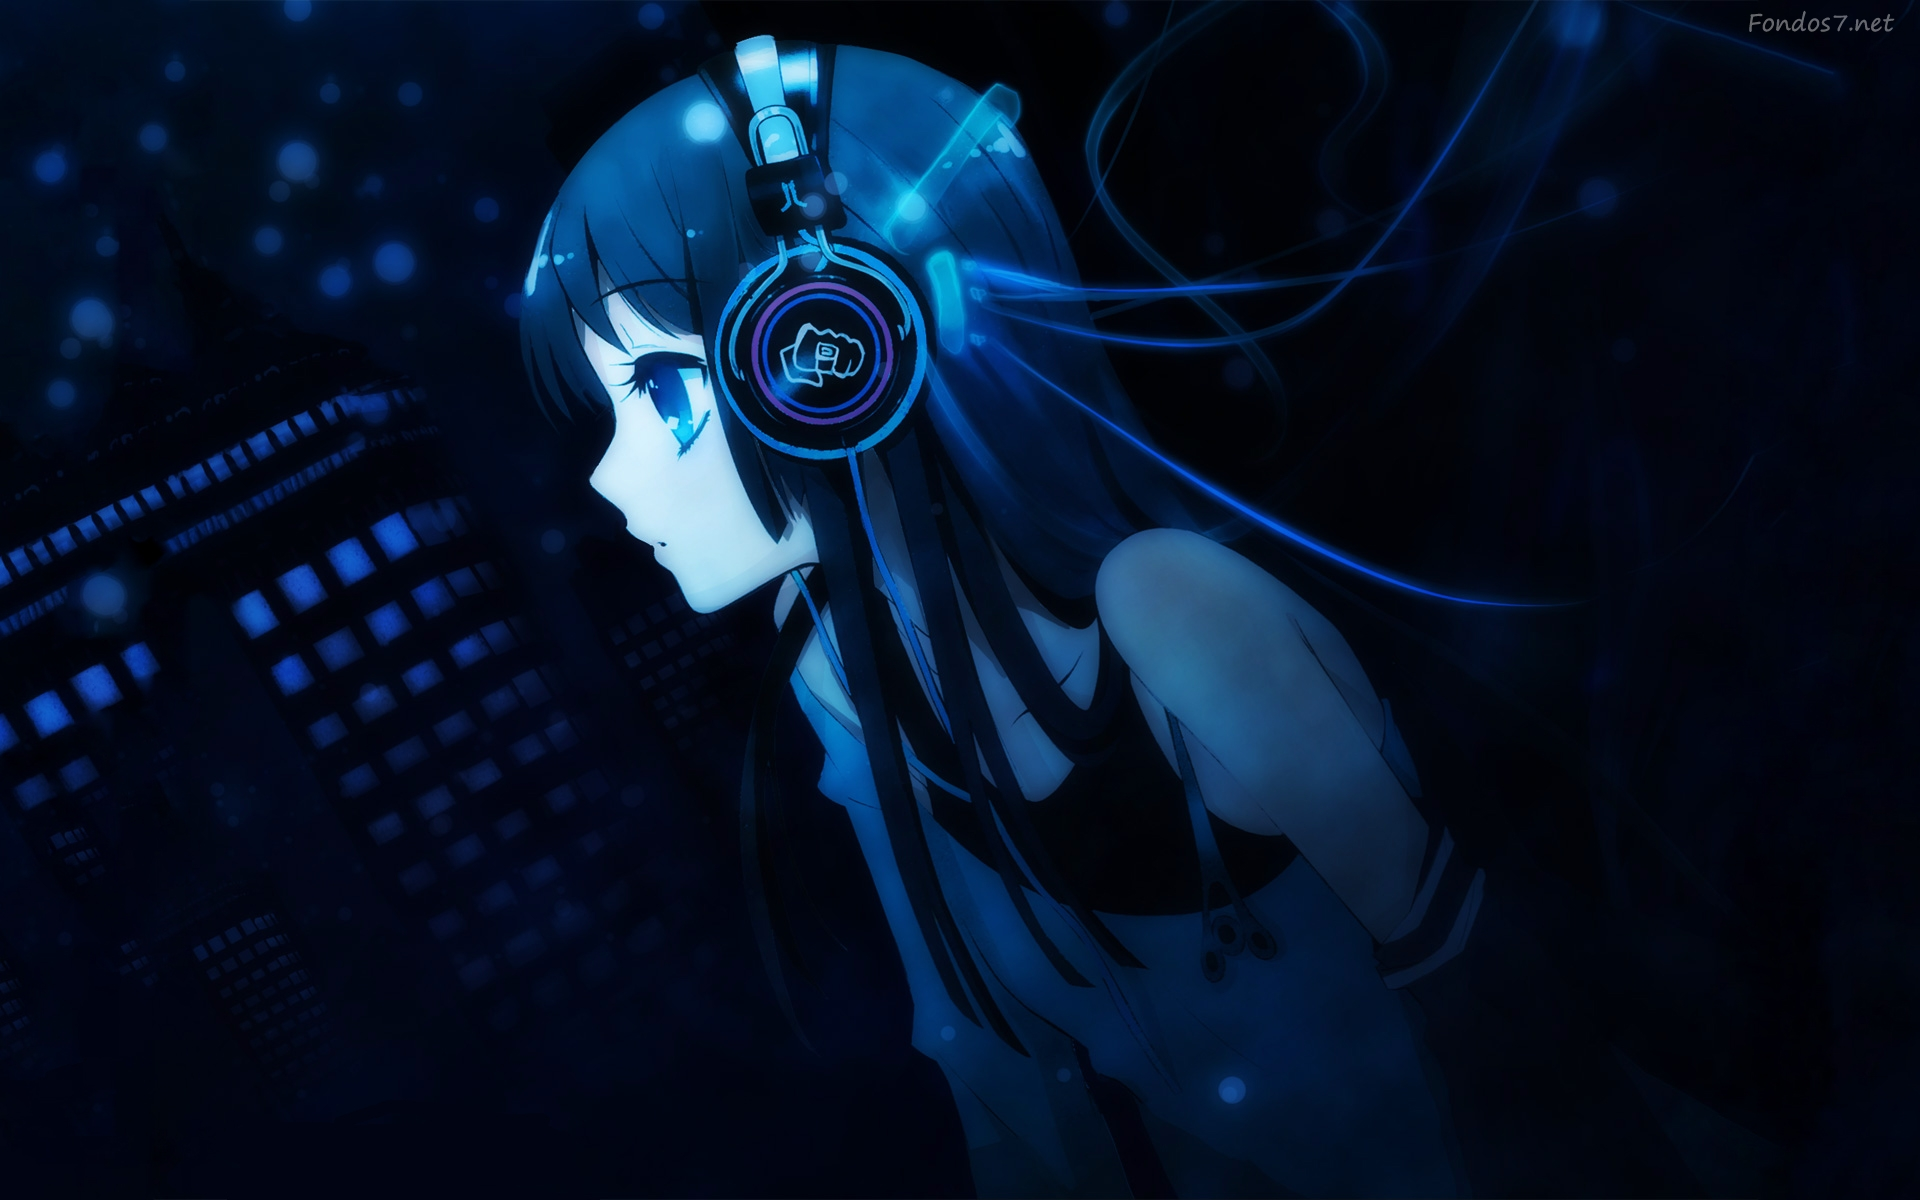 Fondos de pantalla anime hd fondos de pantalla for Imagenes wallpaper hd